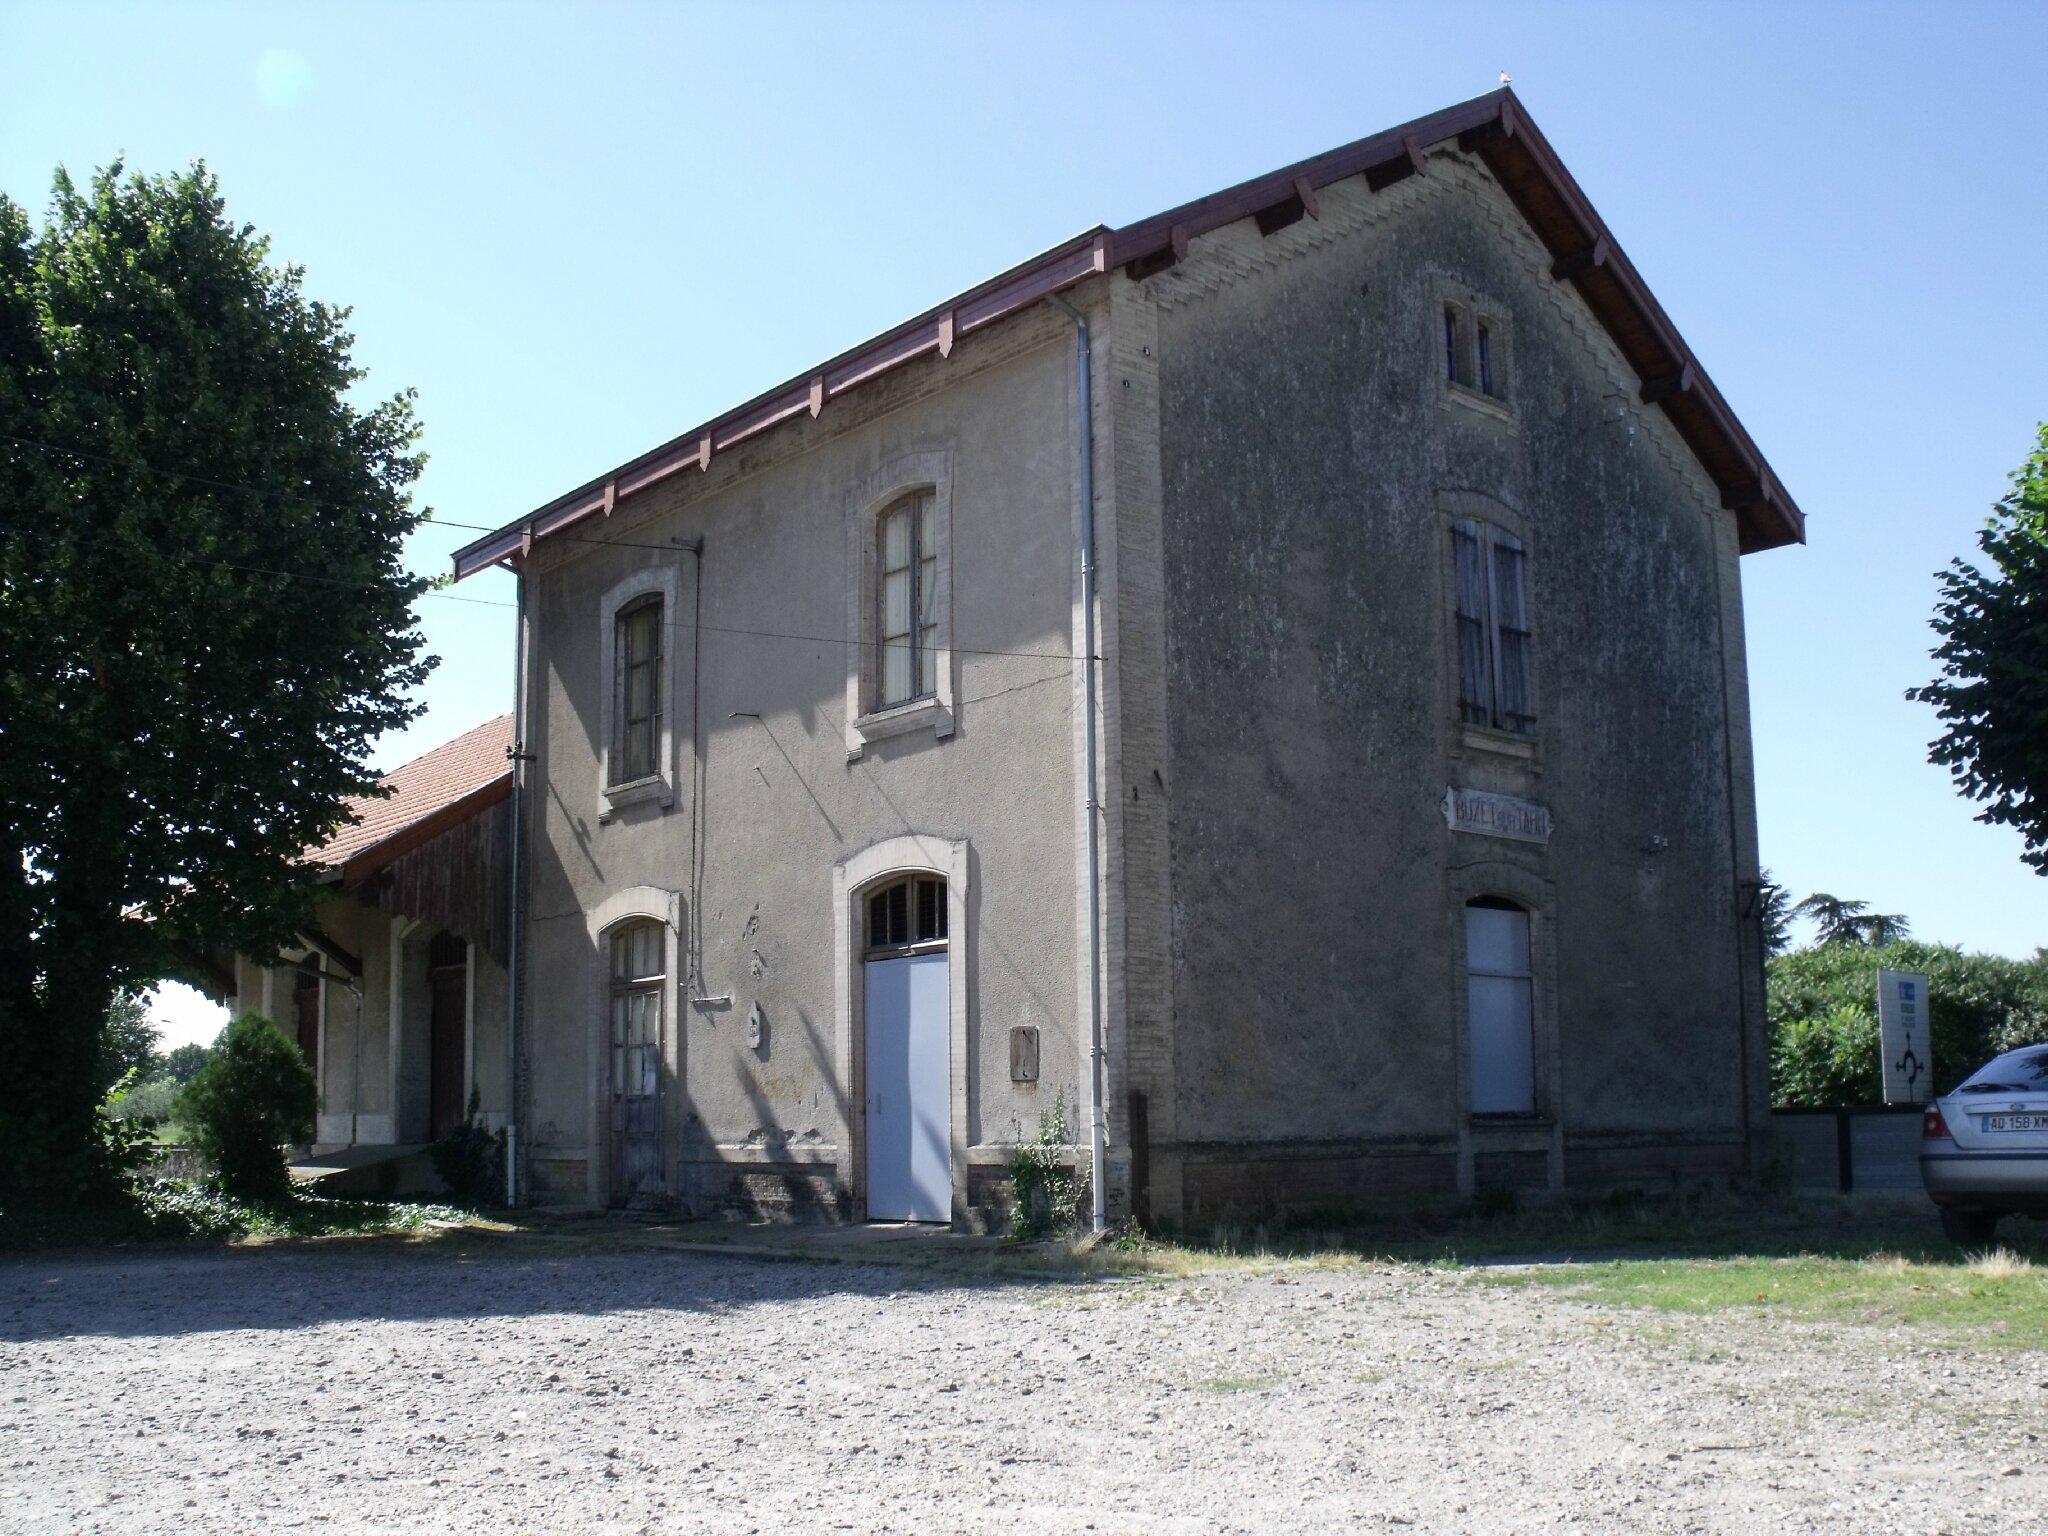 Buzet-sur-Tarn (Haute-Garonne - 31)